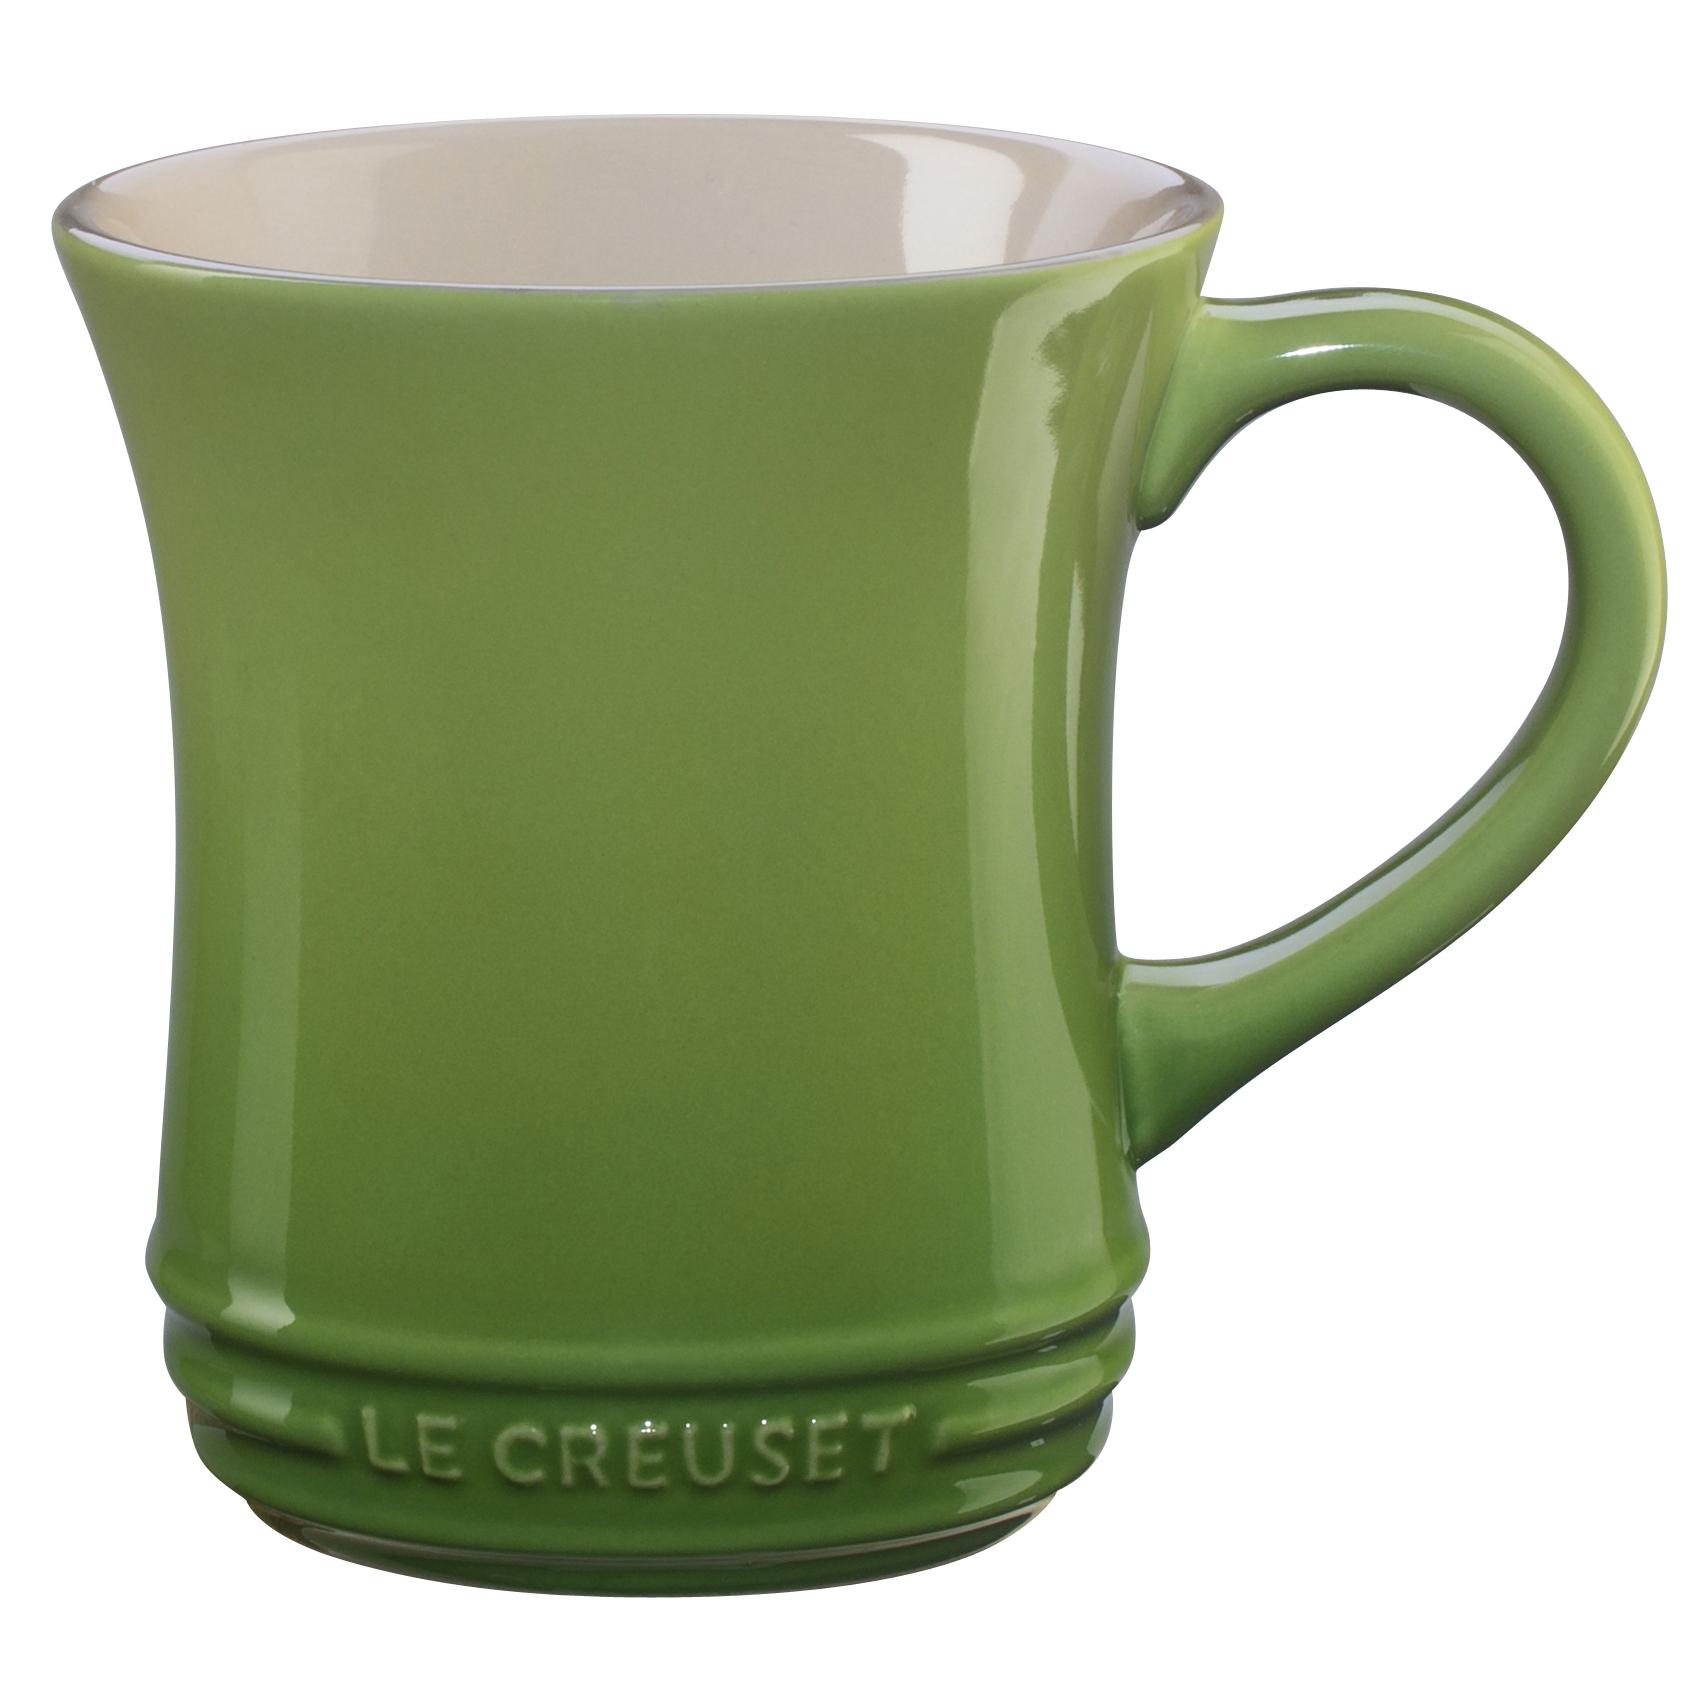 Le Creuset Palm Stoneware Tea Mug, 14 Ounce